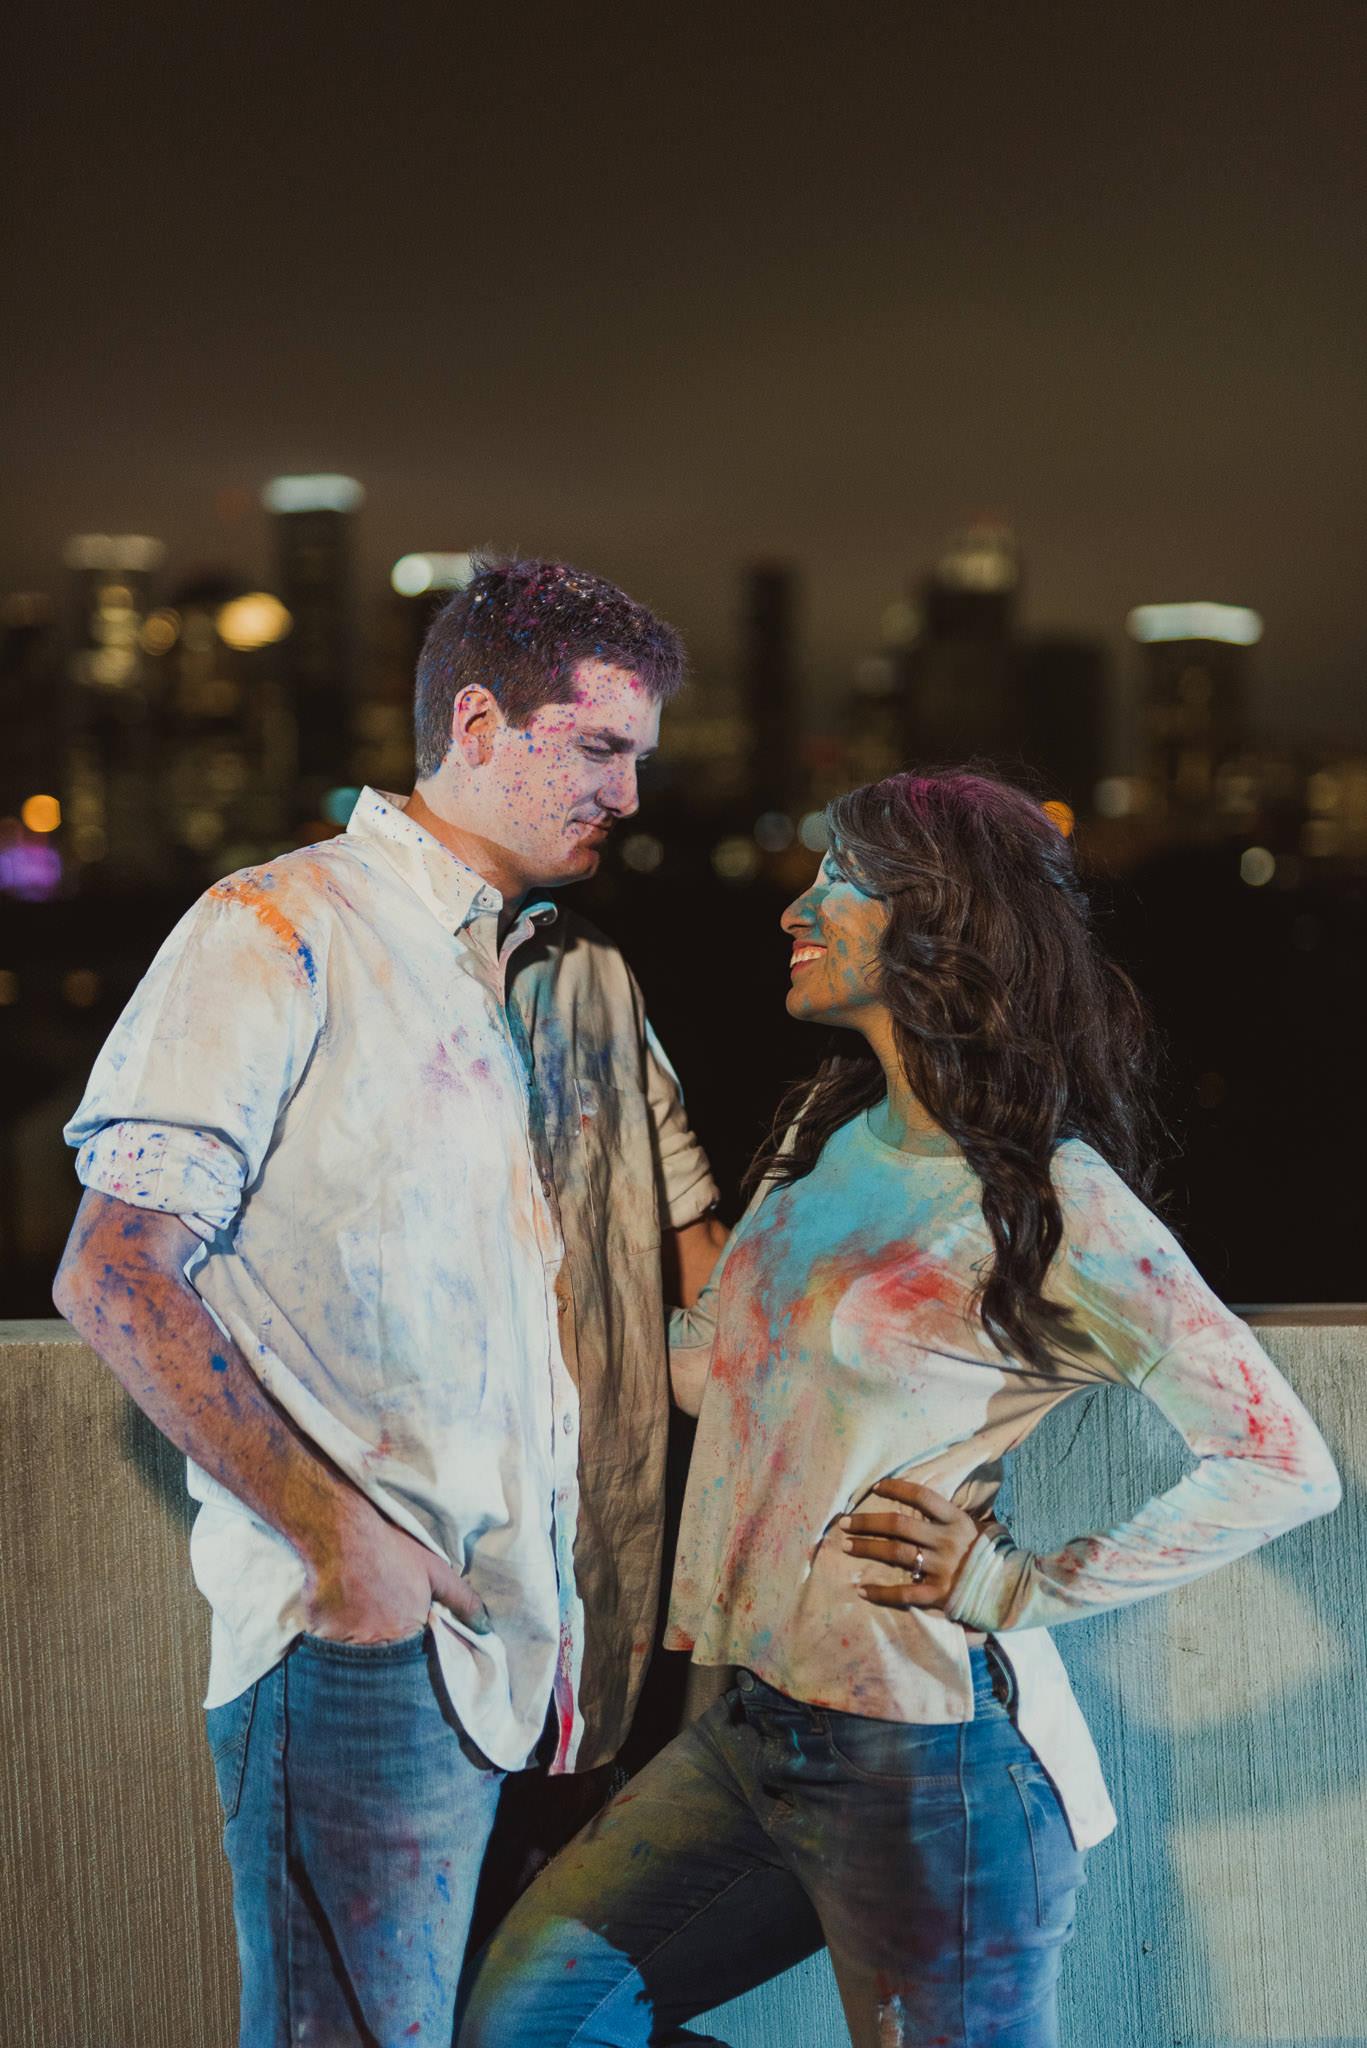 Houston-holi-powder-color-engagement-fun-fight-night